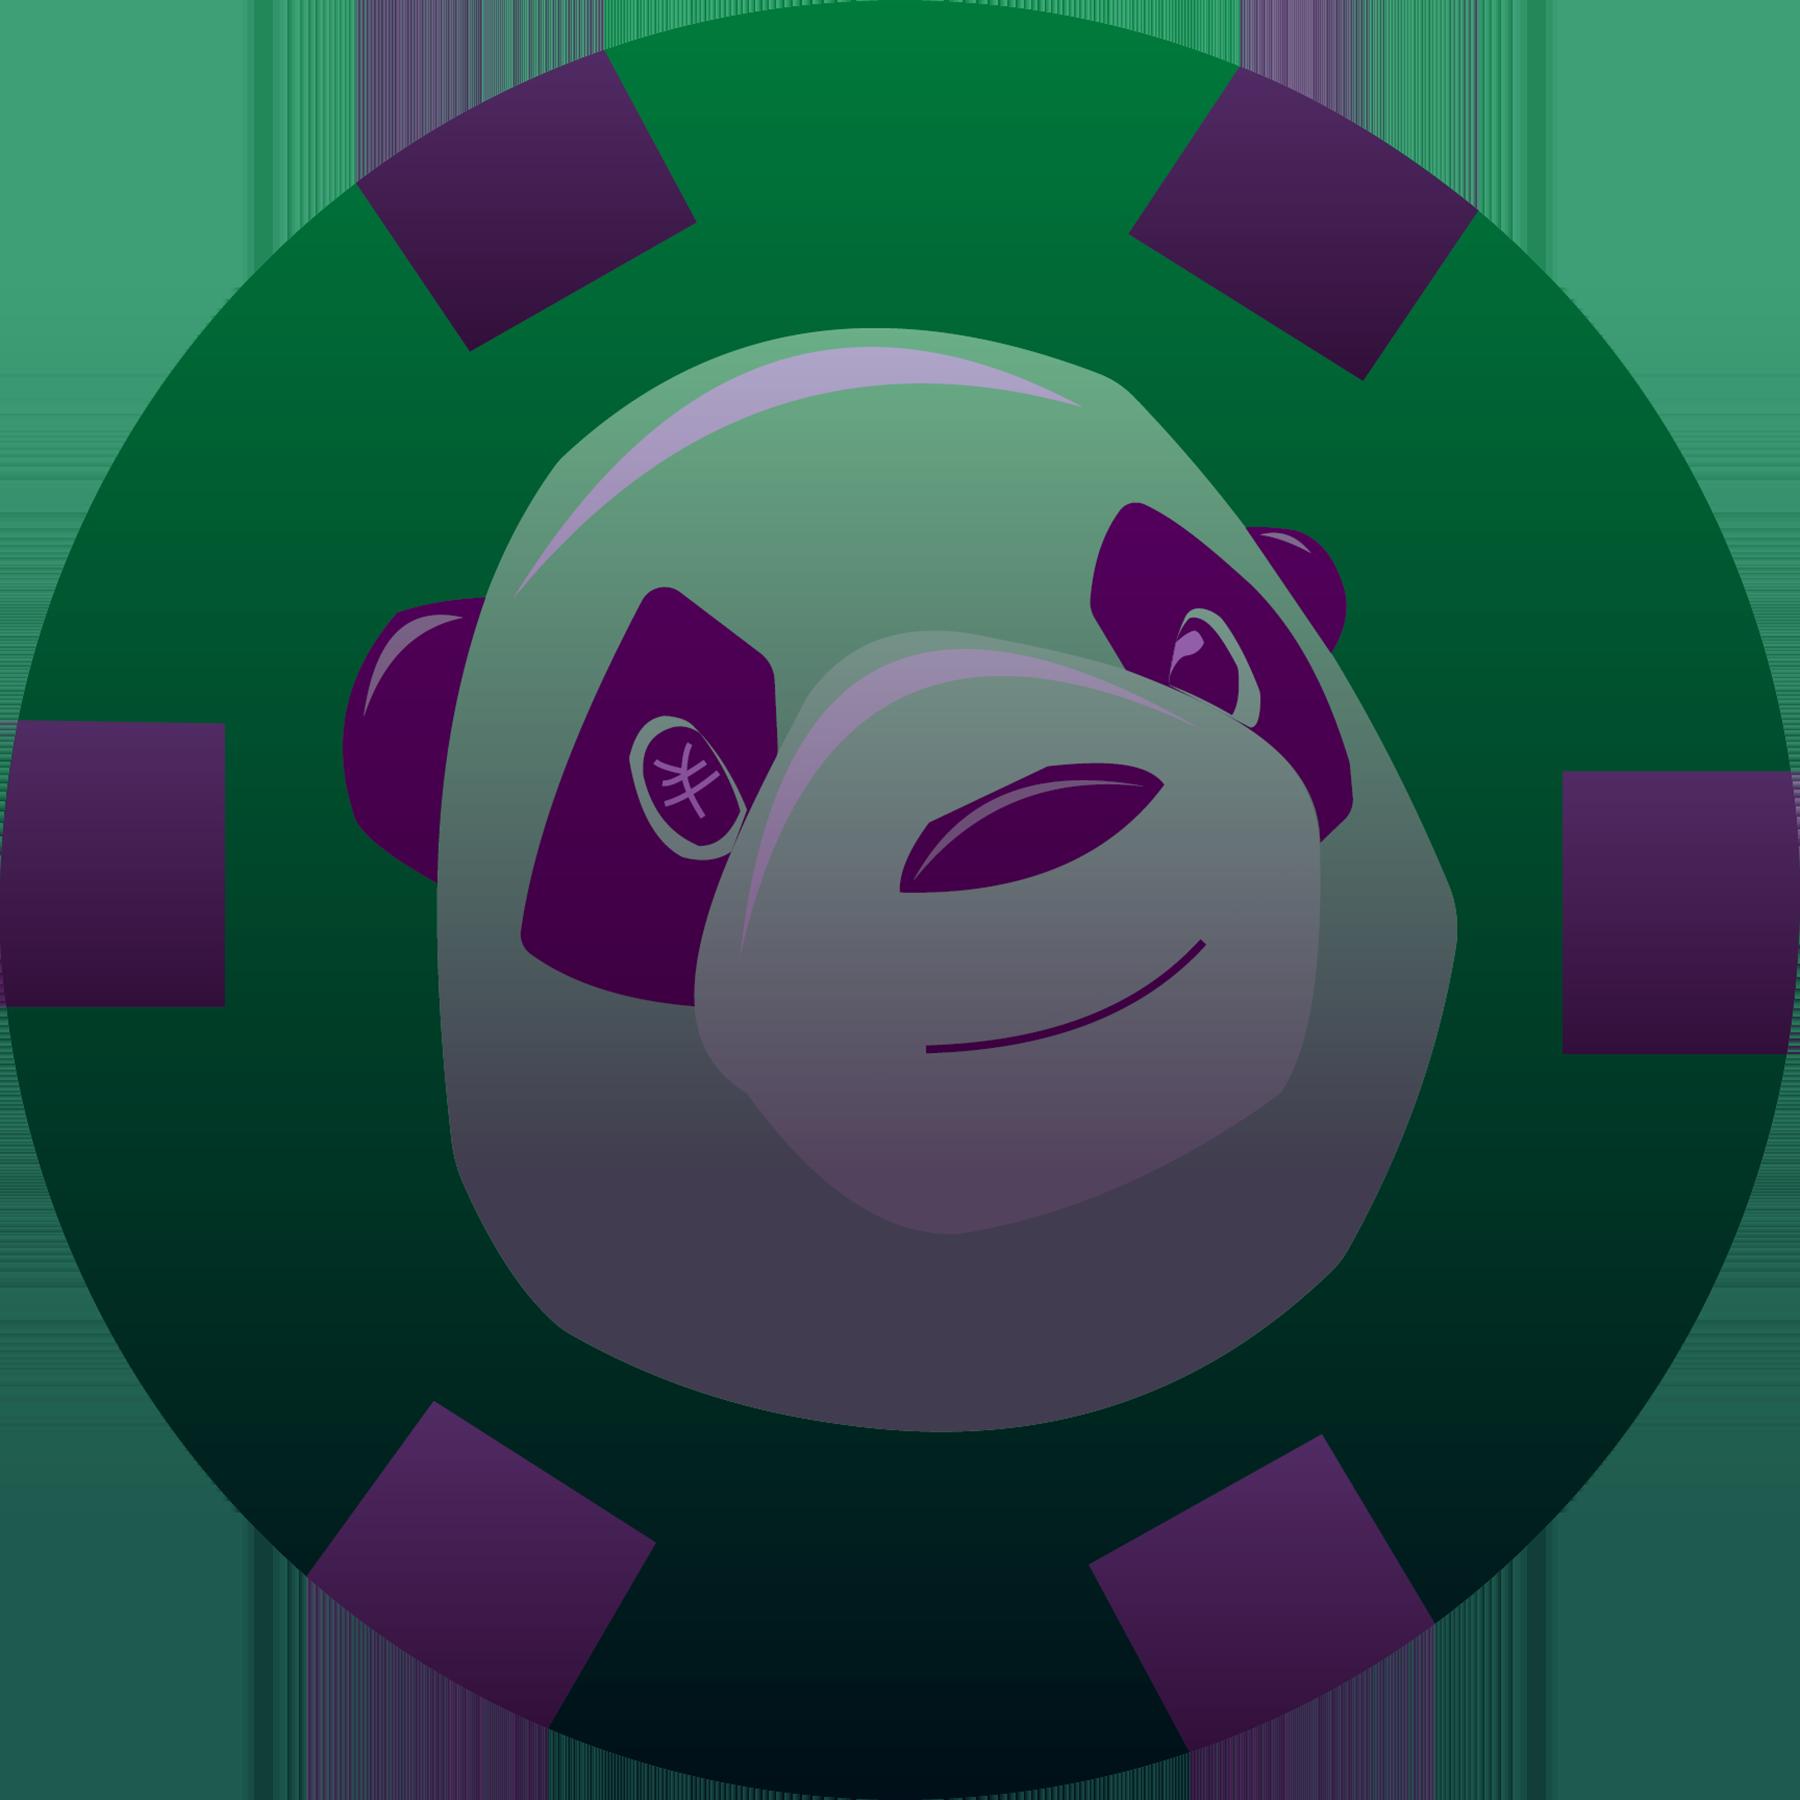 circle-design_0003_Pampy-Chip@4x.png